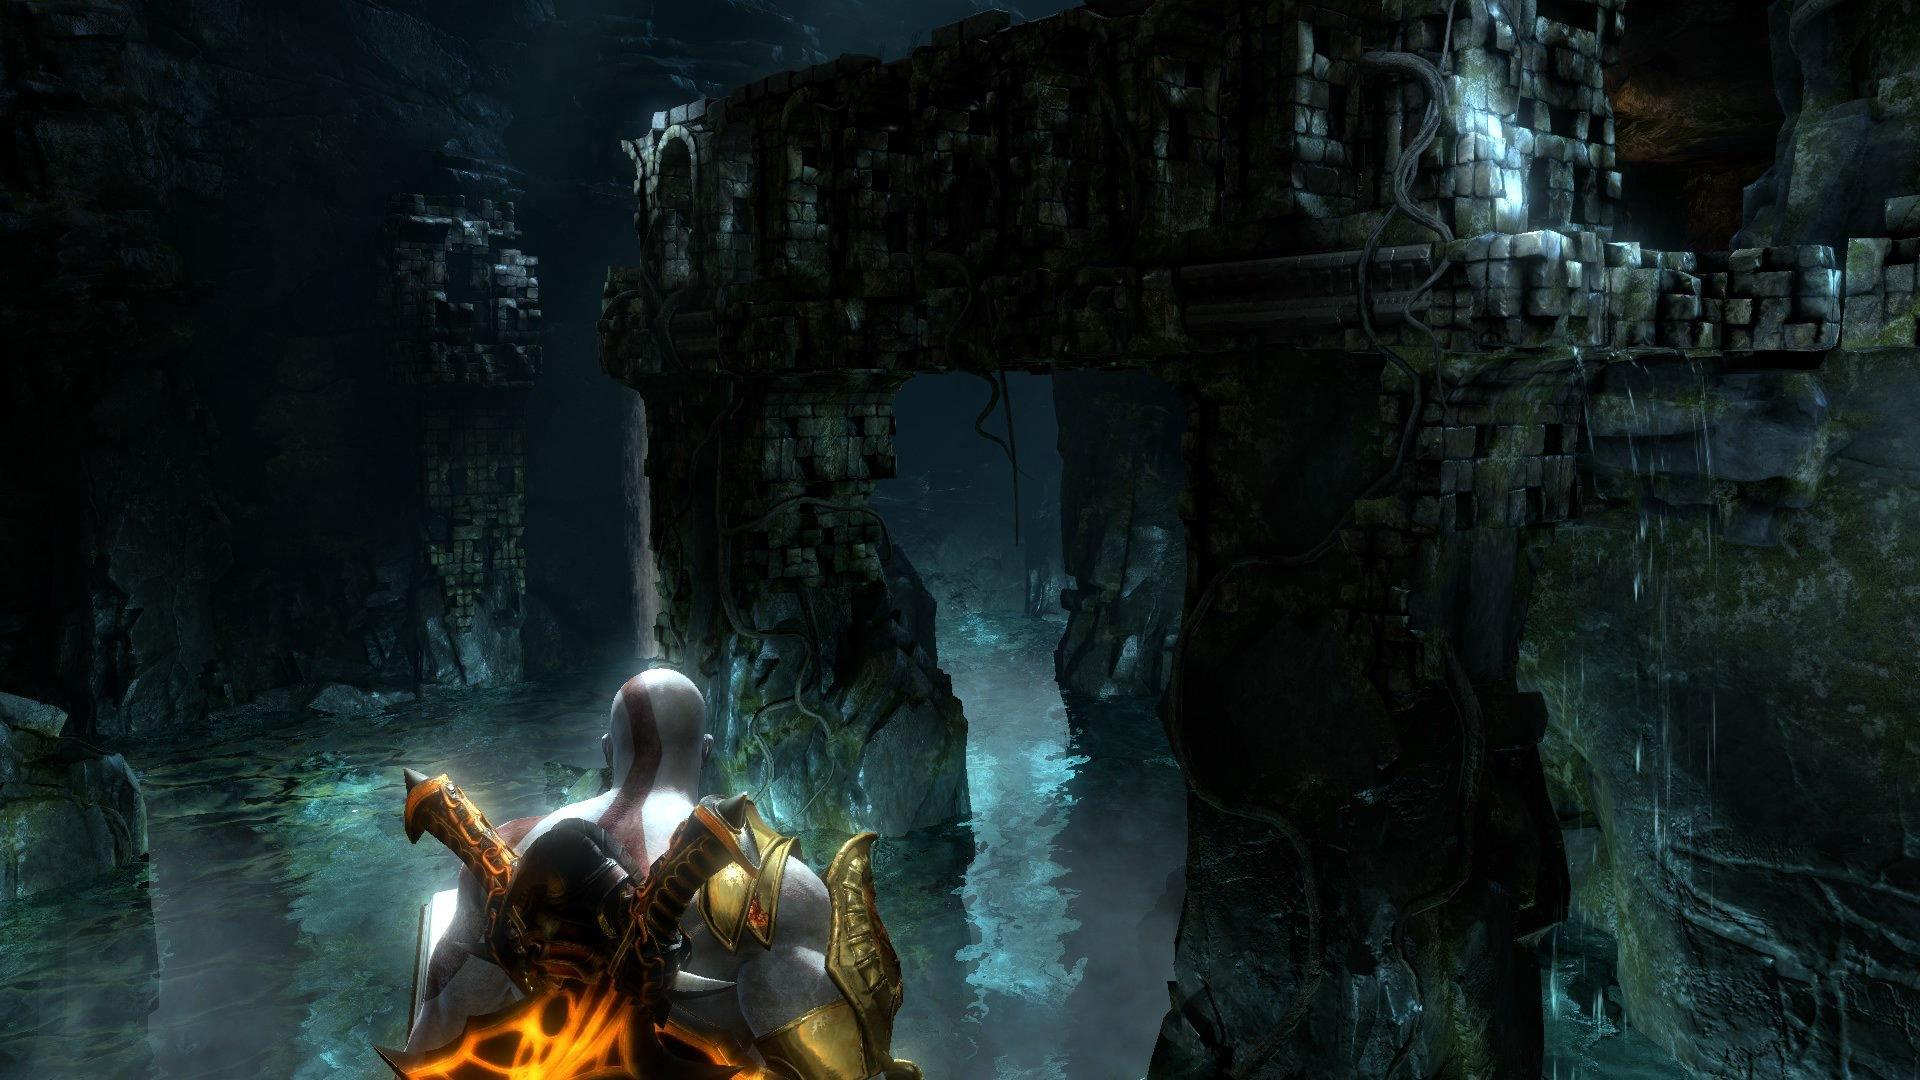 God of war iii remastered ps4 playstation 4 news - God of war wallpaper for ps4 ...